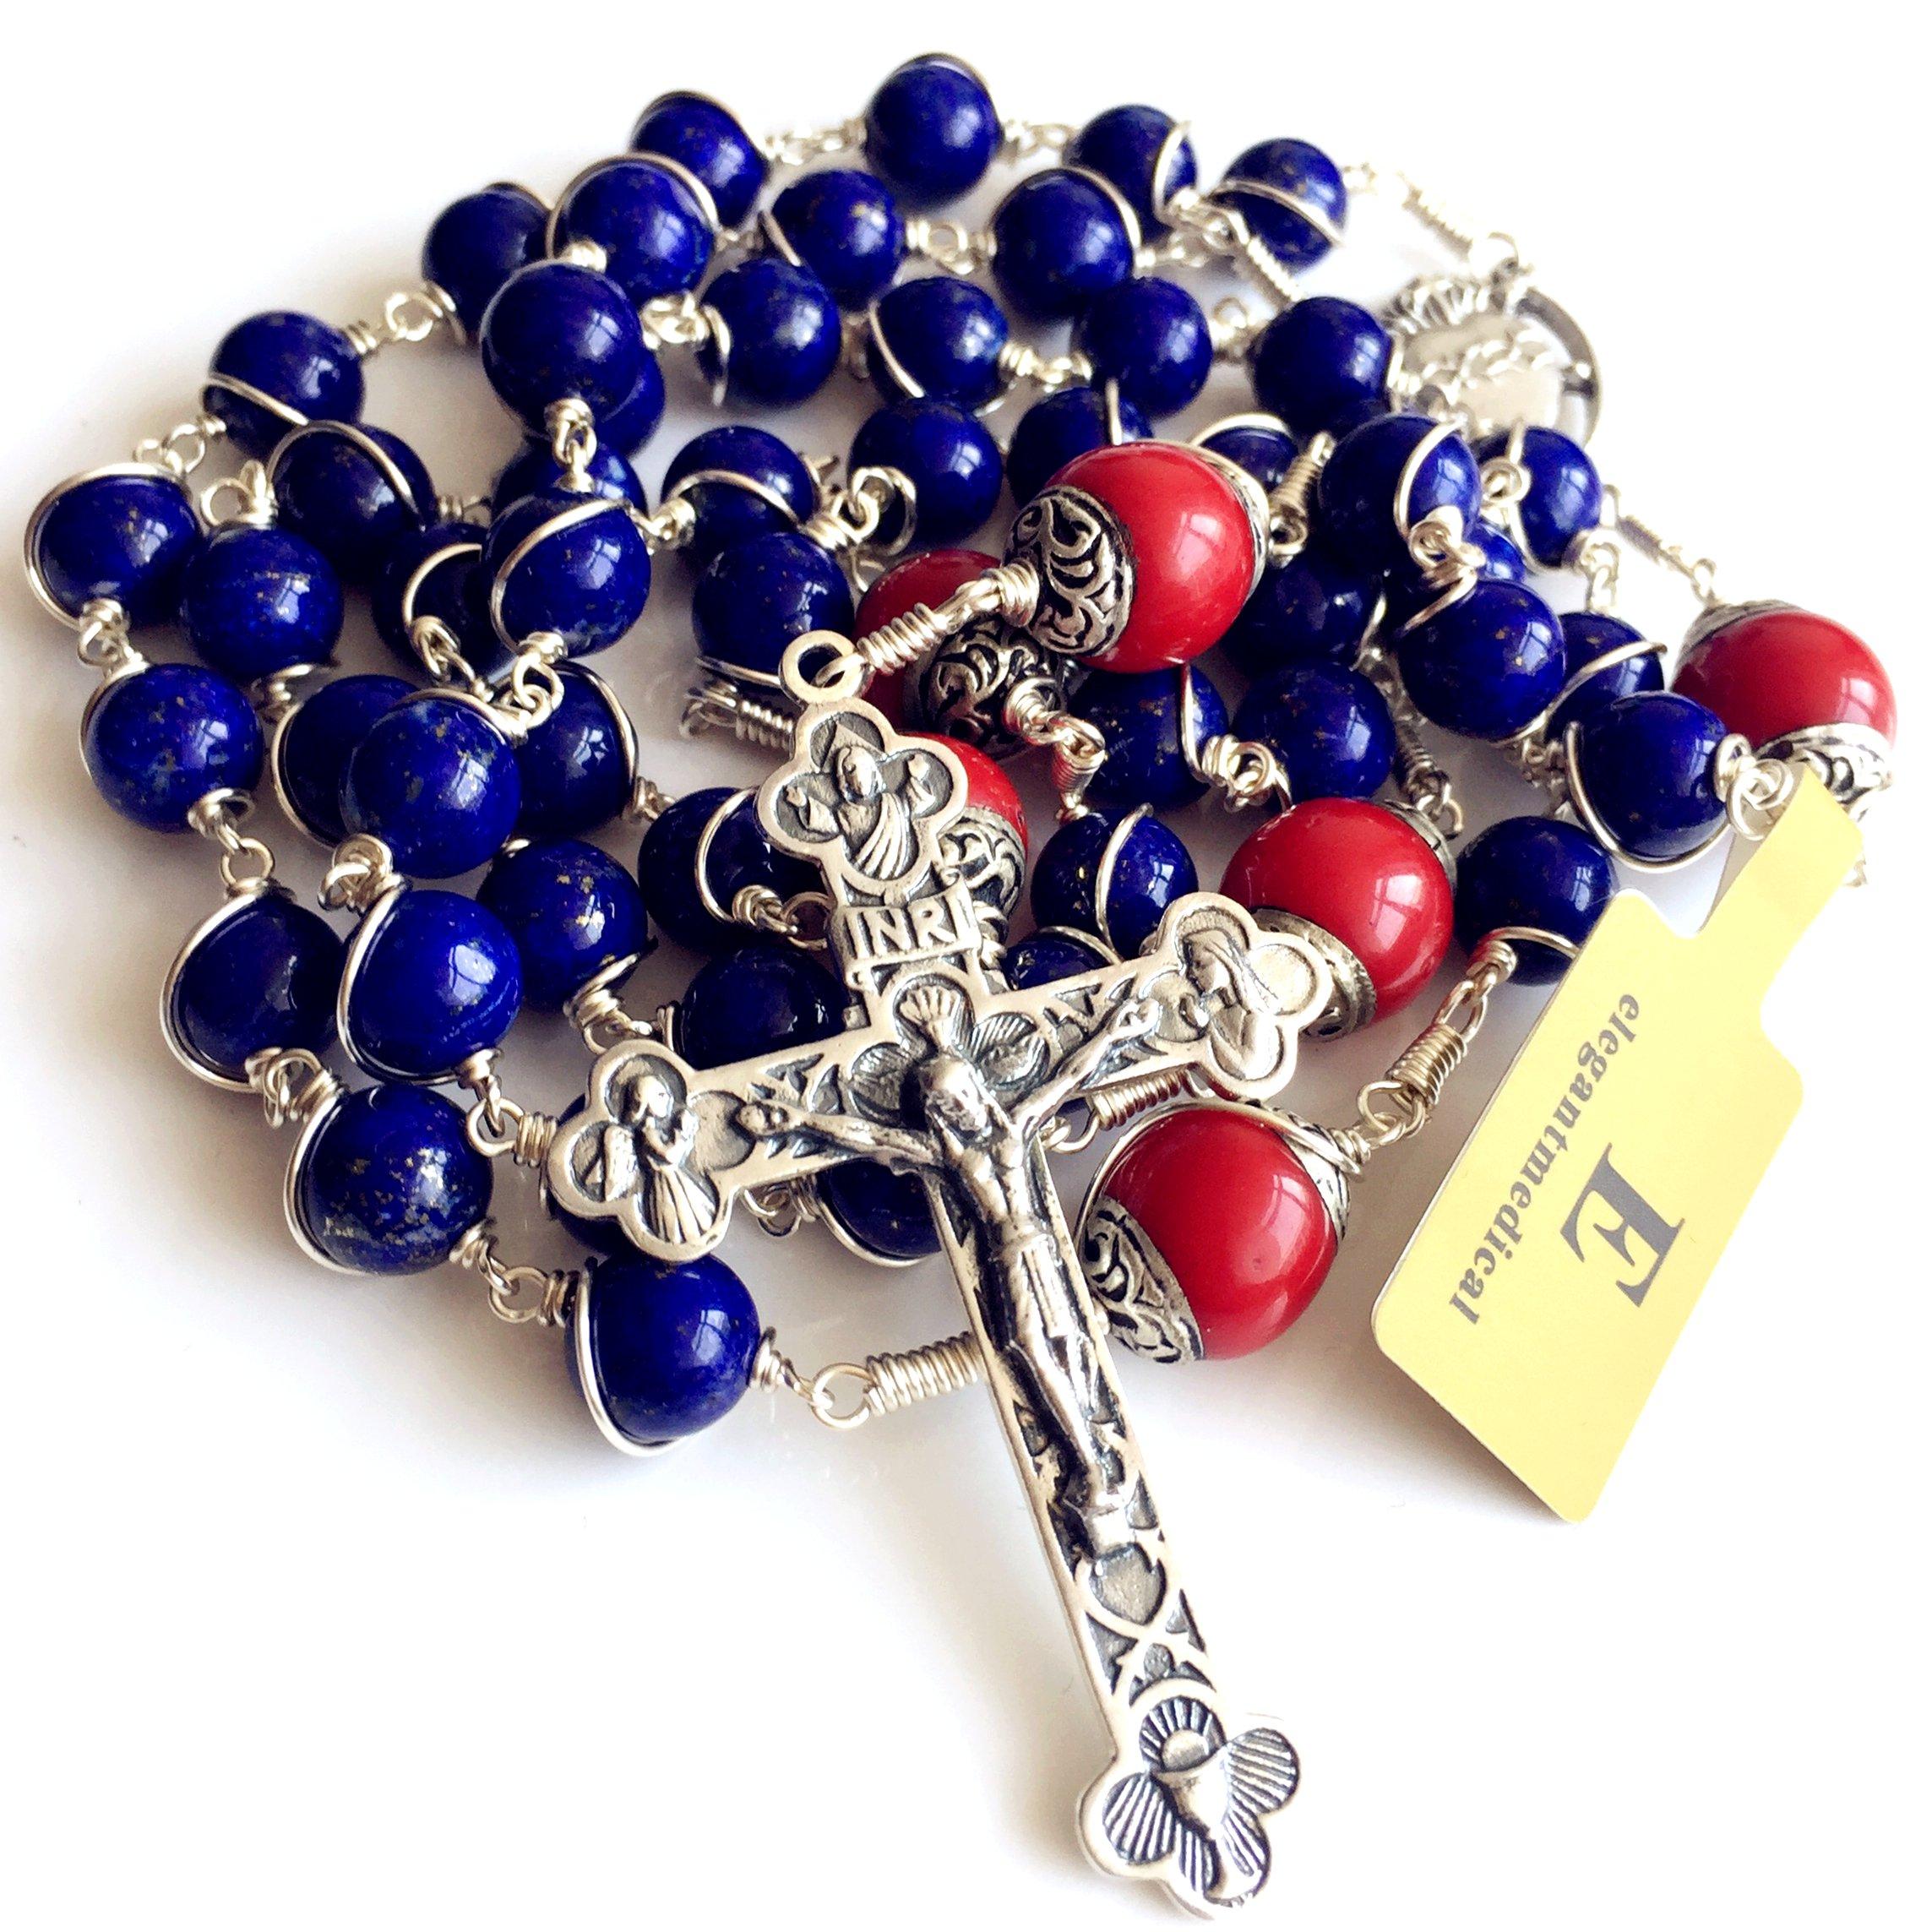 Handmade Sterling 925 Silver Lapis Lazuli Beads Rosary Cross Crucifix Catholic Necklace Gifts by elegantmedical (Image #9)